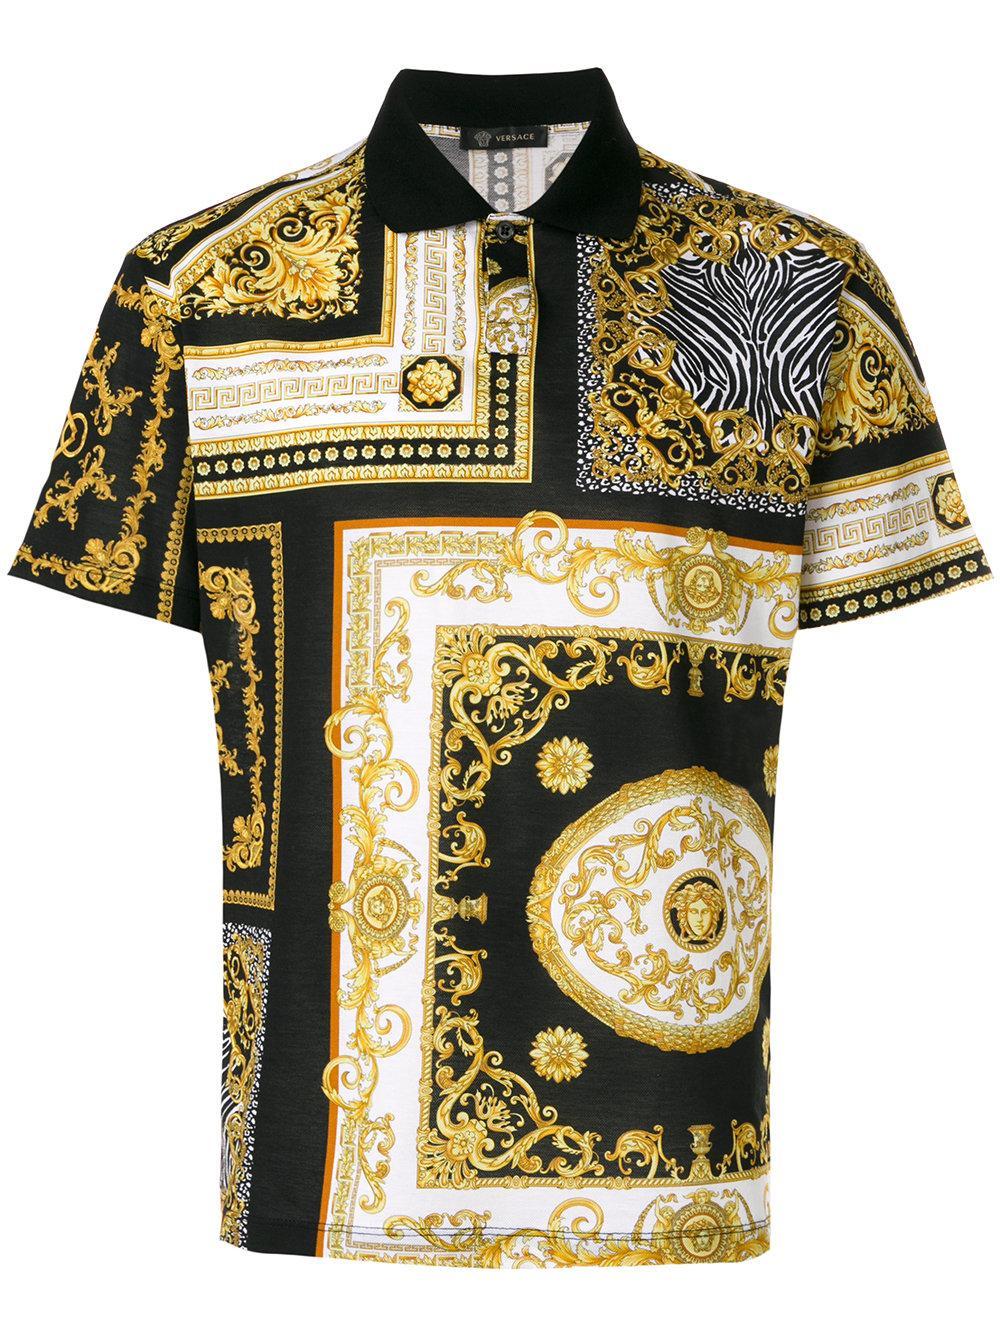 Lyst - Versace Baroque Print T-shirt in Black for Men